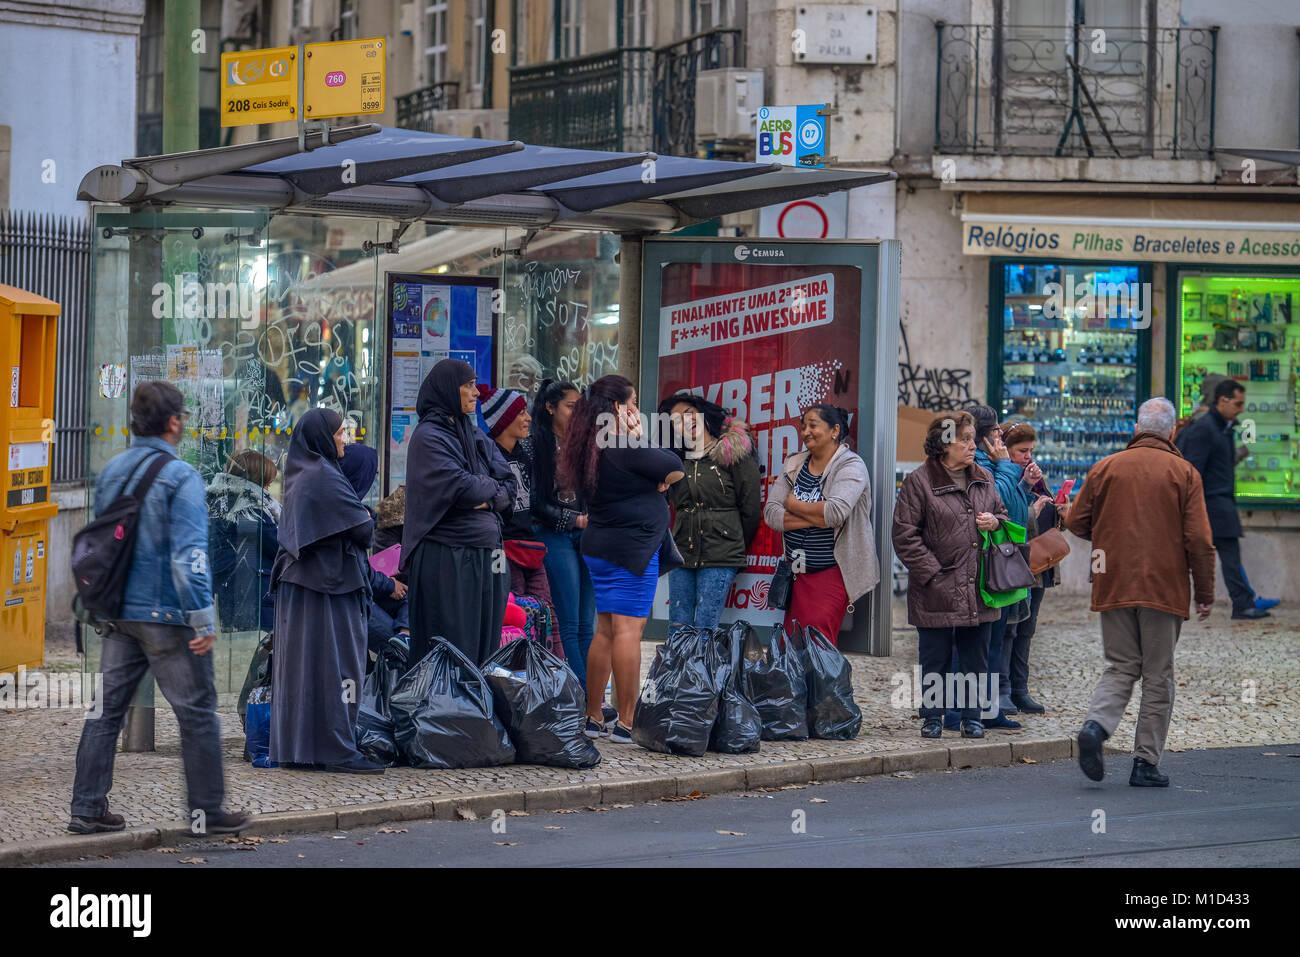 Bus stop, Lisbon, Portugal, Bushaltestelle, Lissabon Stock Photo